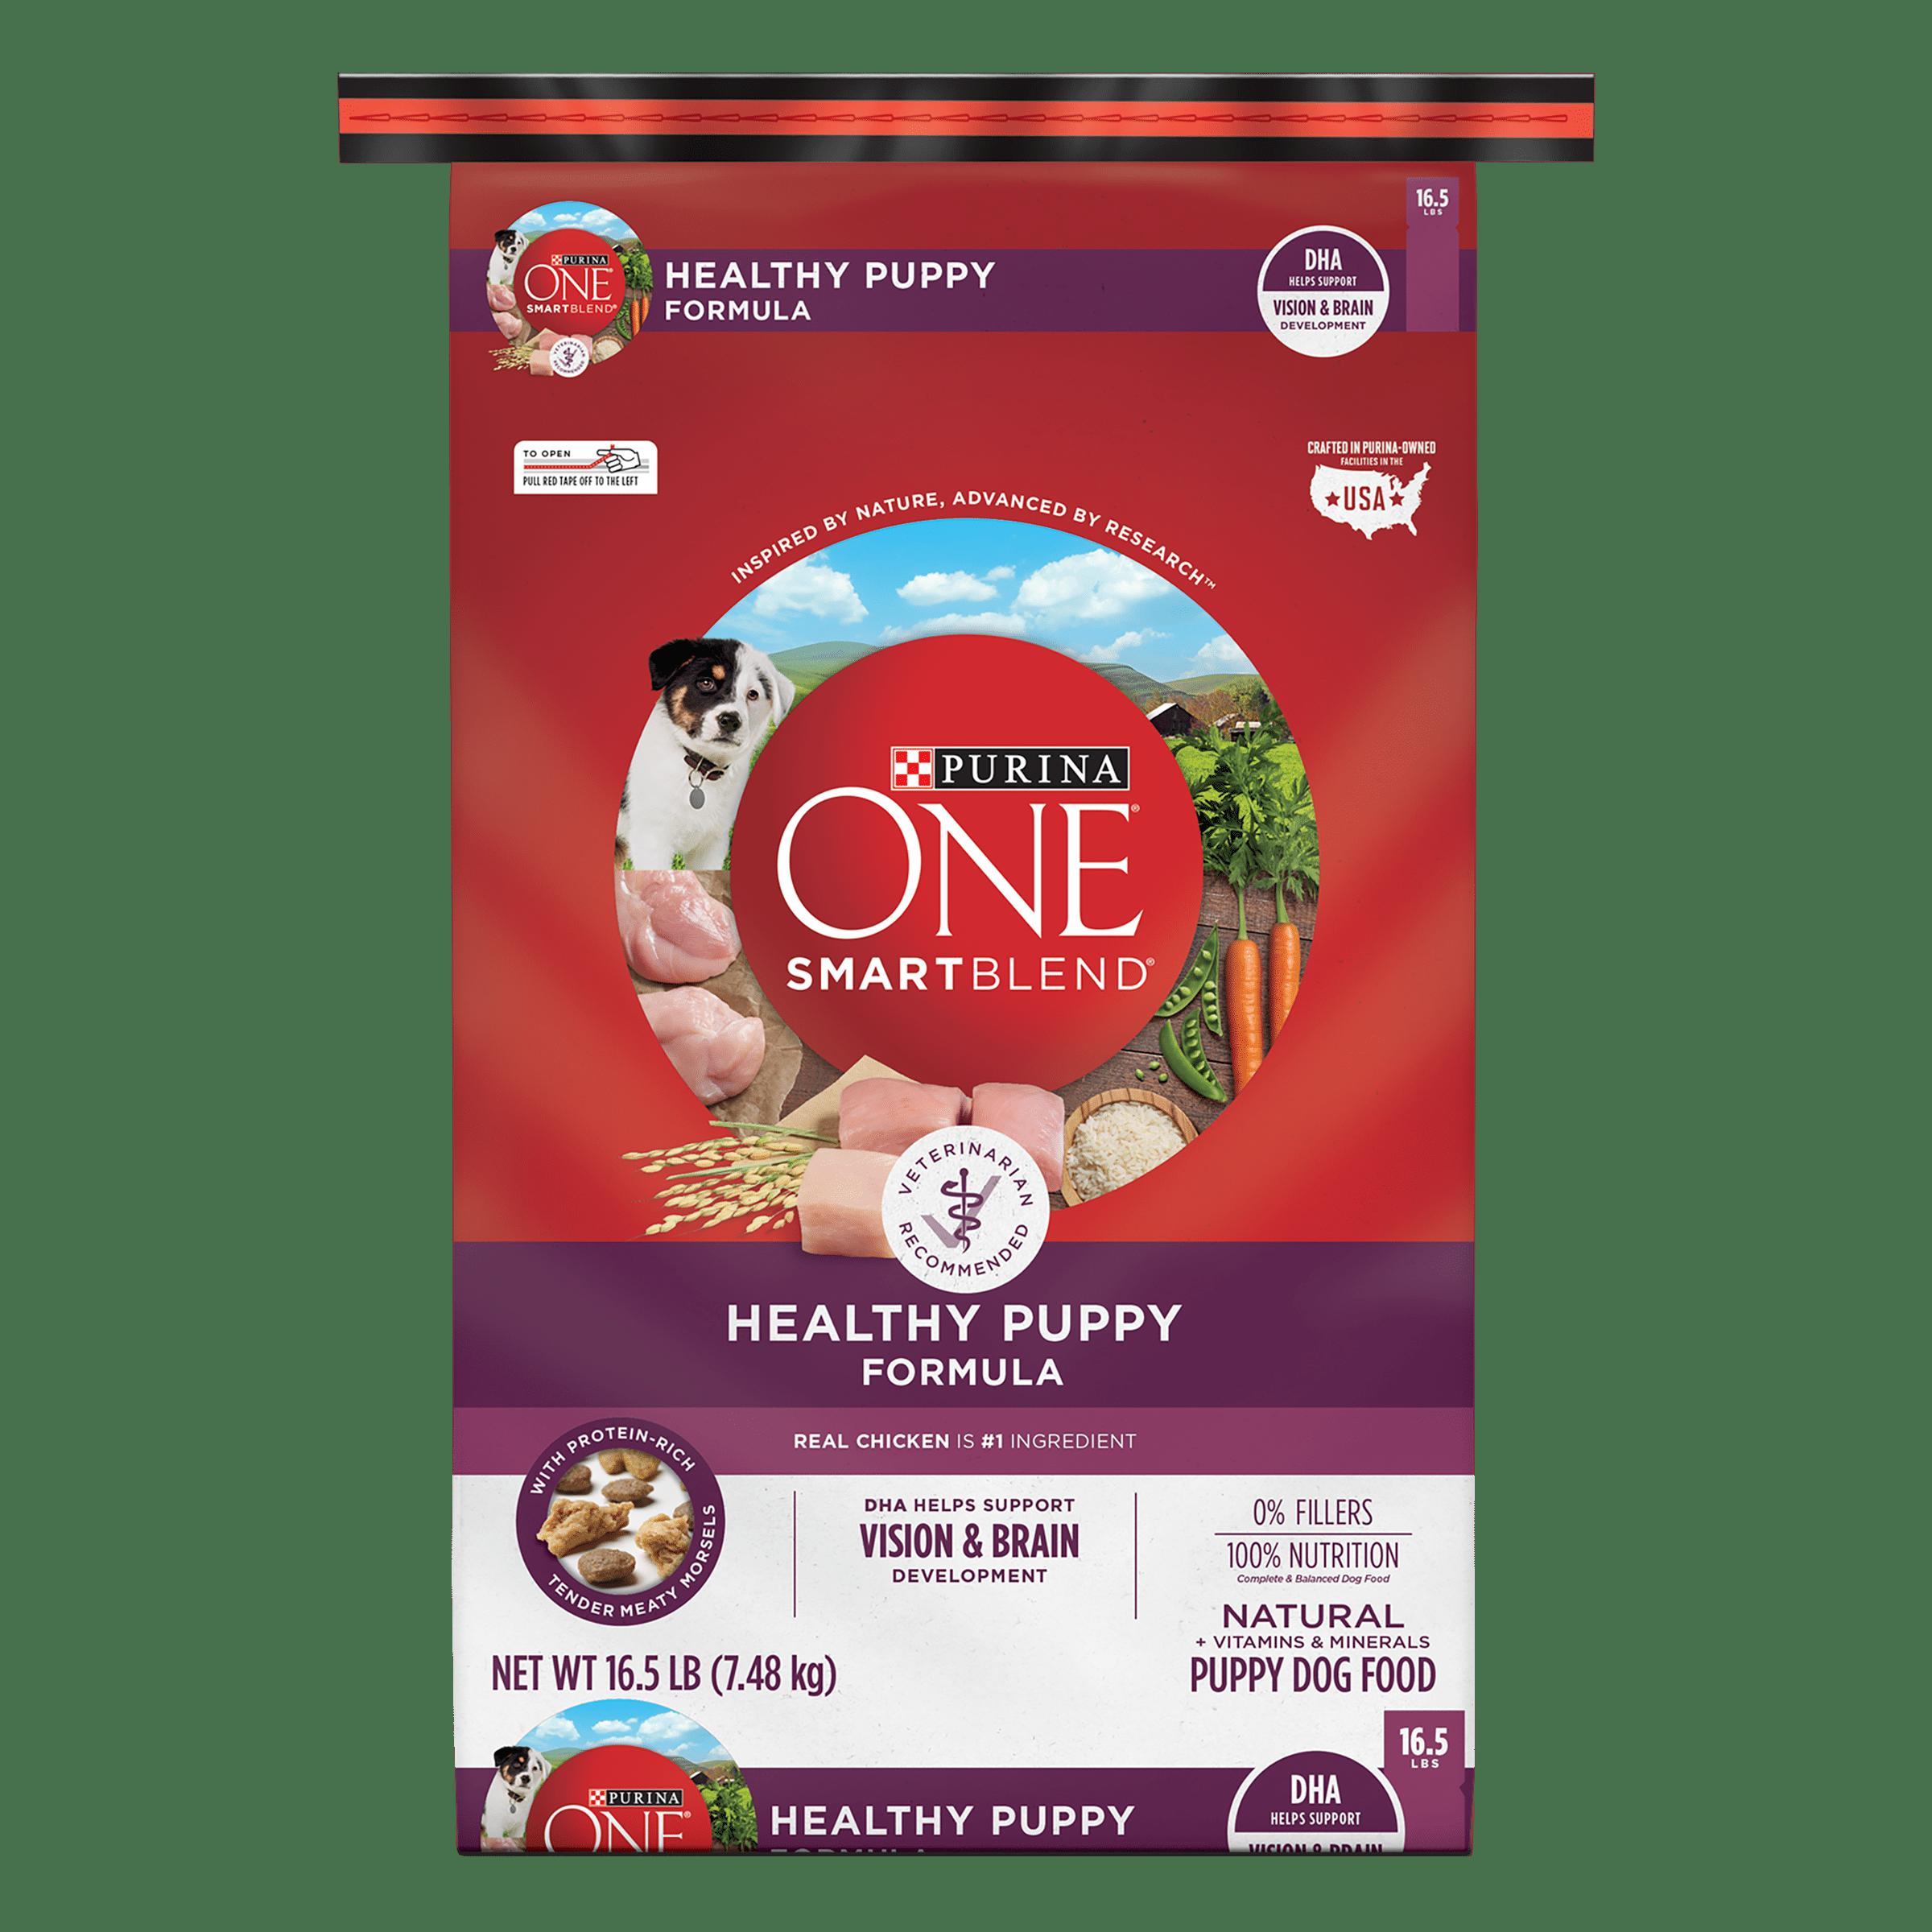 Purina ONE Natural Dry Puppy Food; SmartBlend Healthy Puppy Formula 16.5 lb. Bag by Nestlé Purina PetCare Company